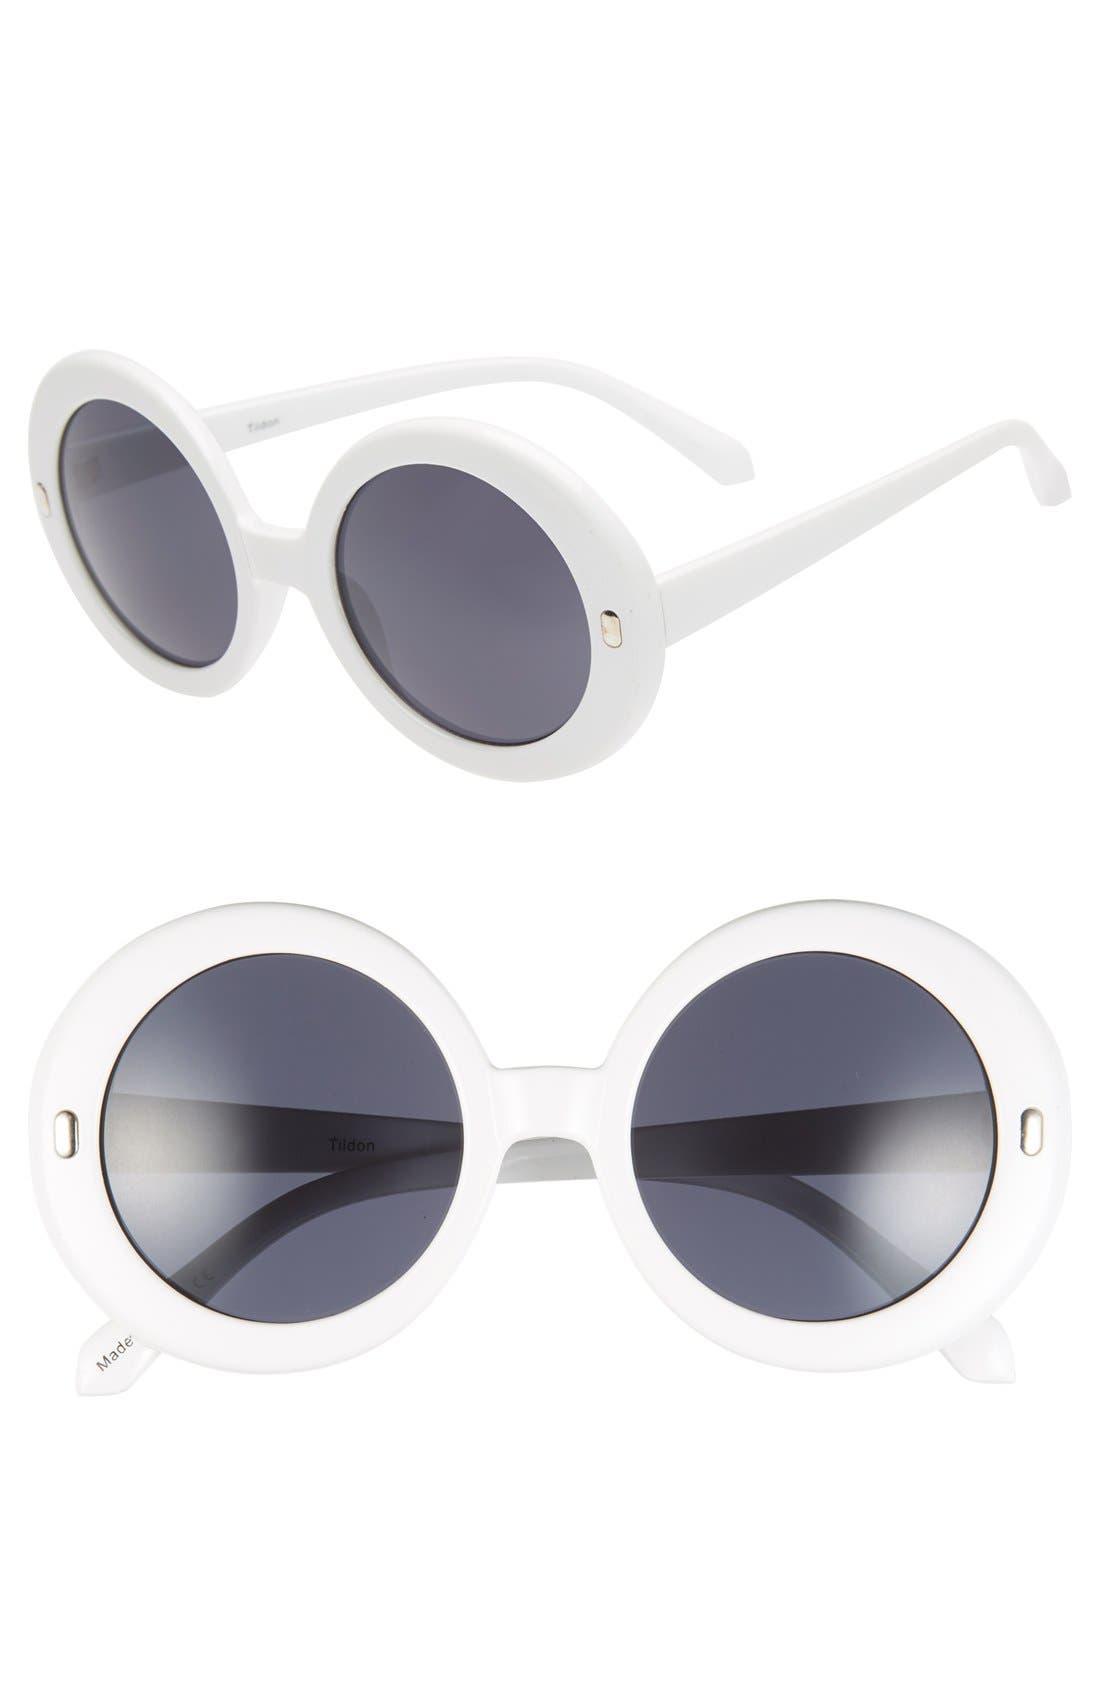 Main Image - Tildon 60mm Round Sunglasses